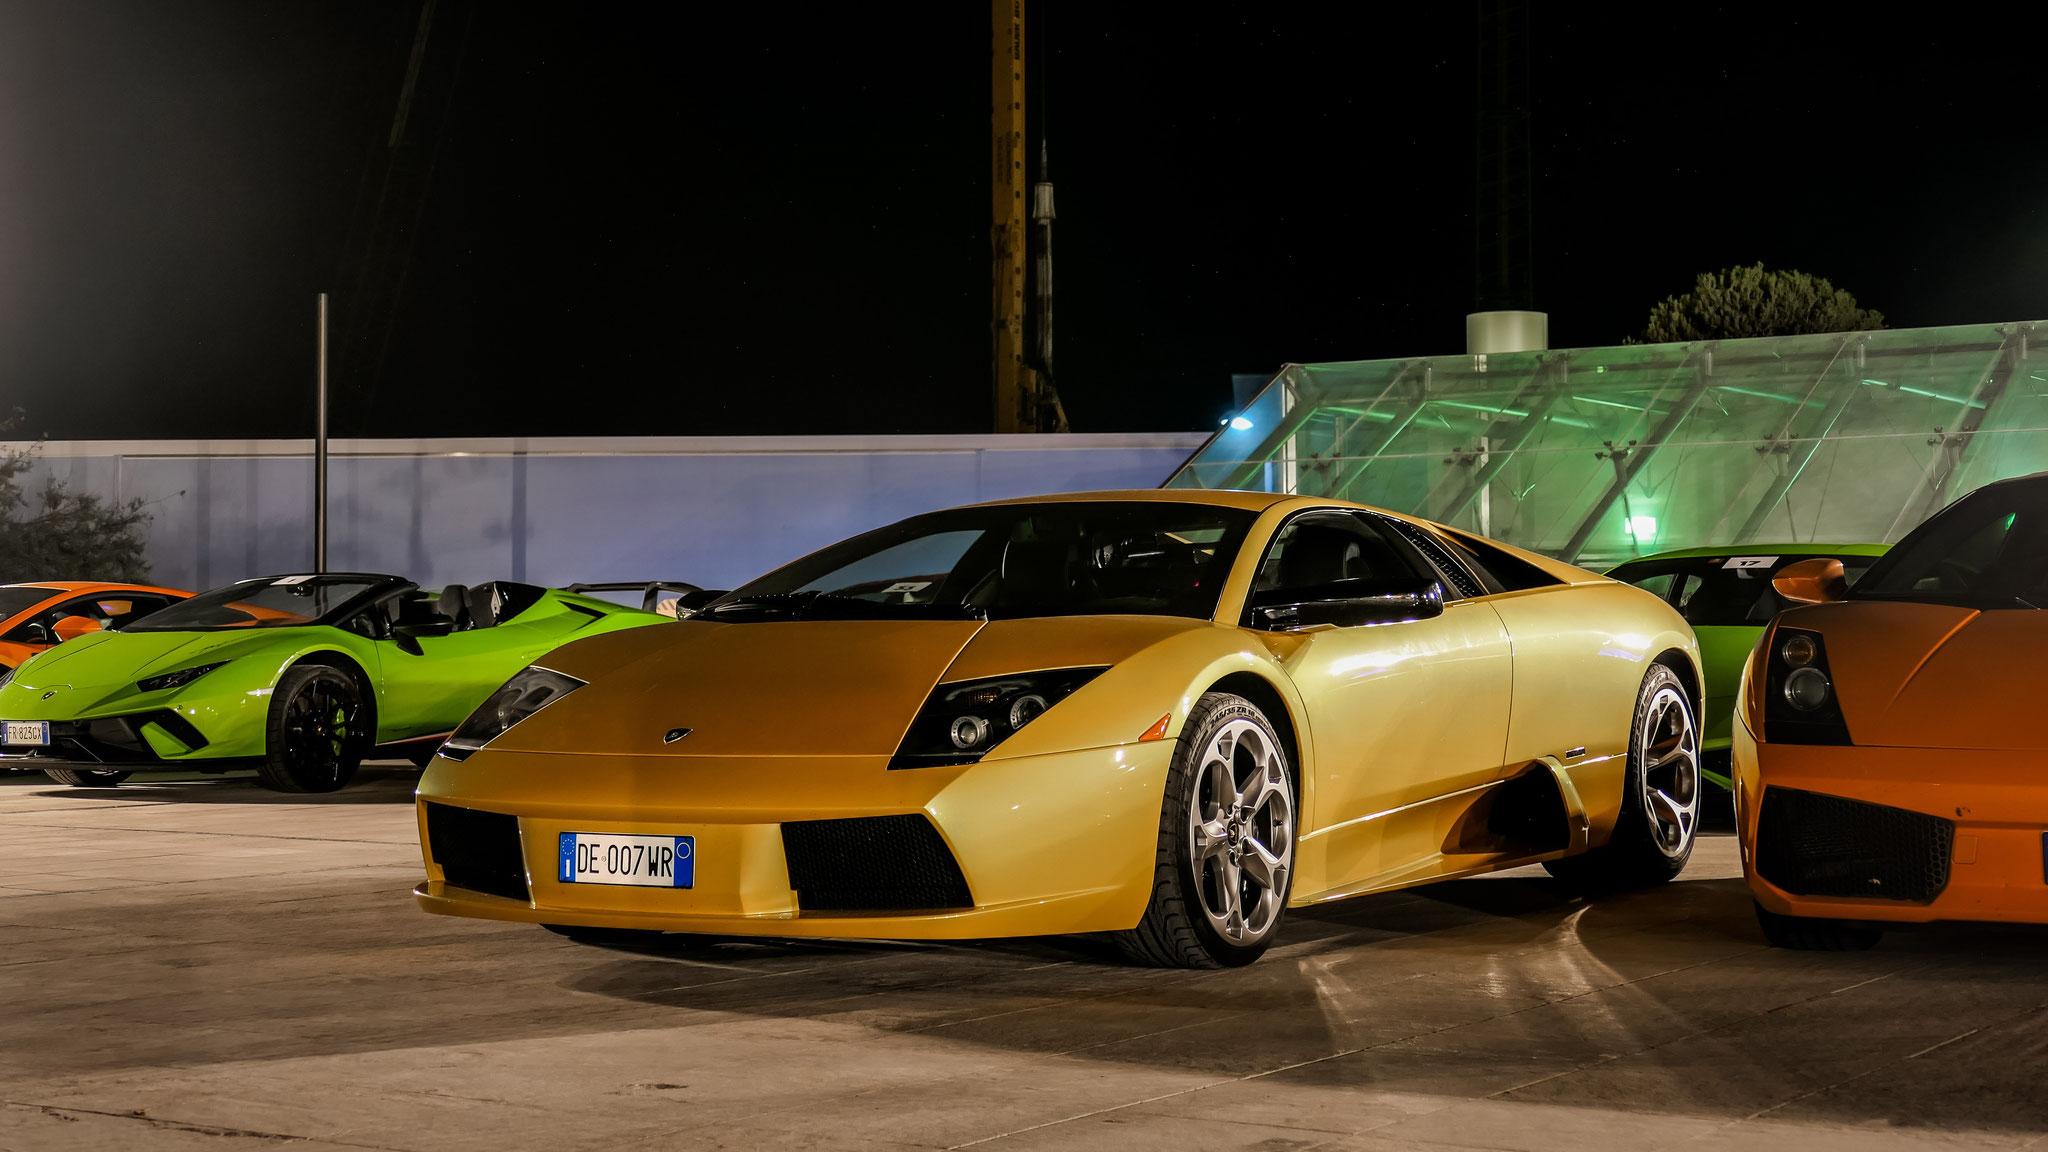 Lamborghini Murcielago - DE-007-WR (ITA)